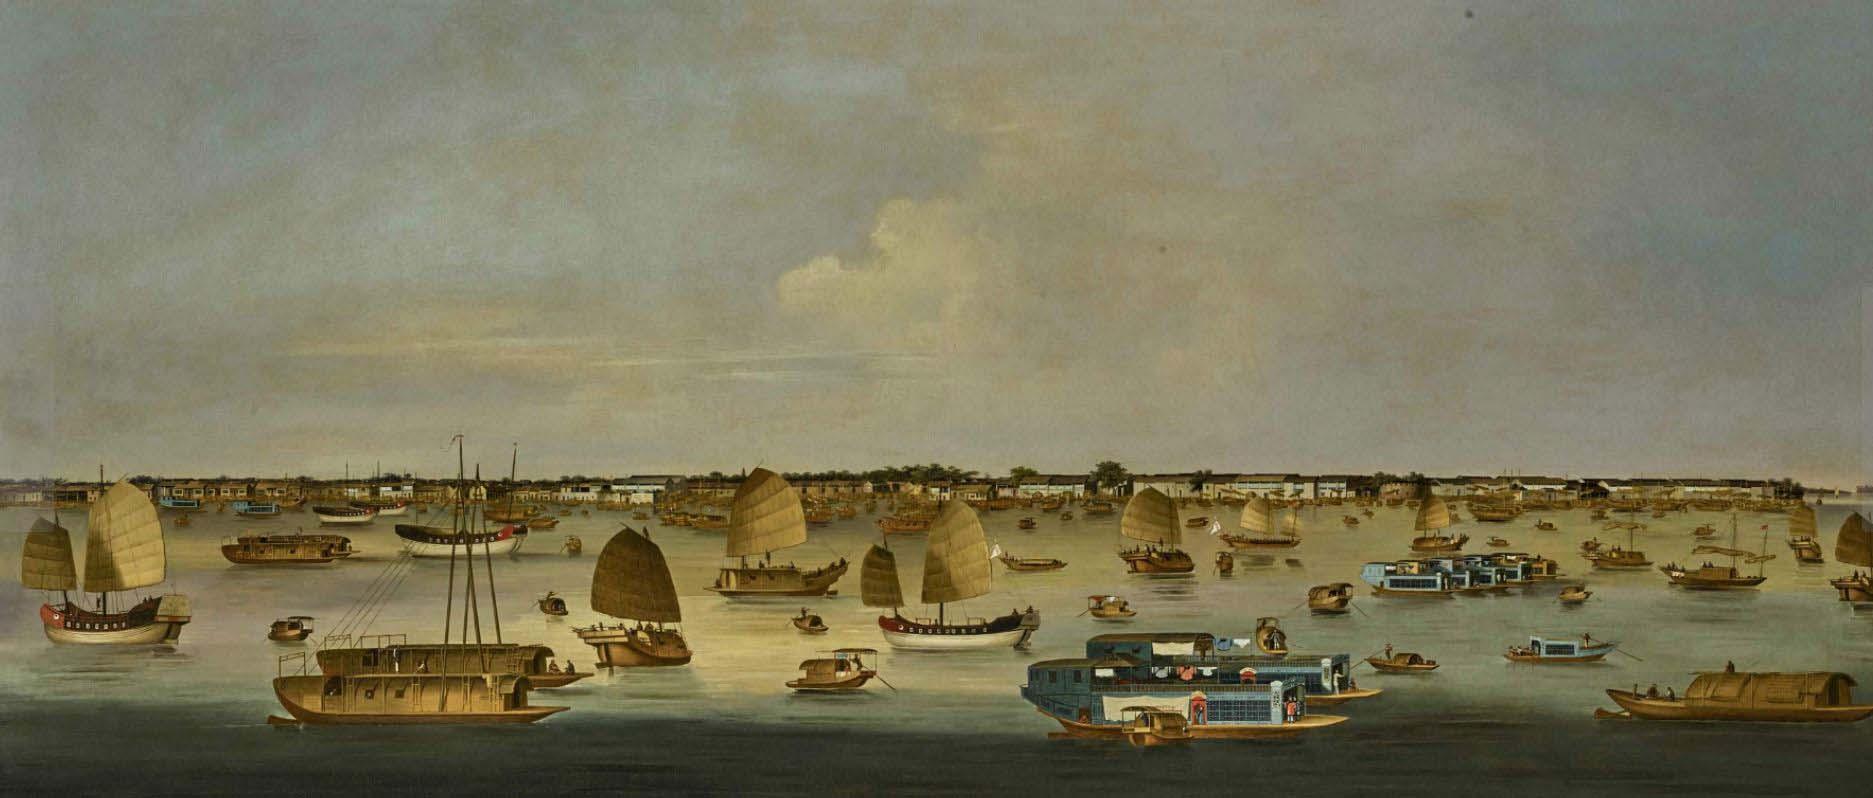 Painting PEARL RIVER OFF HONAM ISLAND